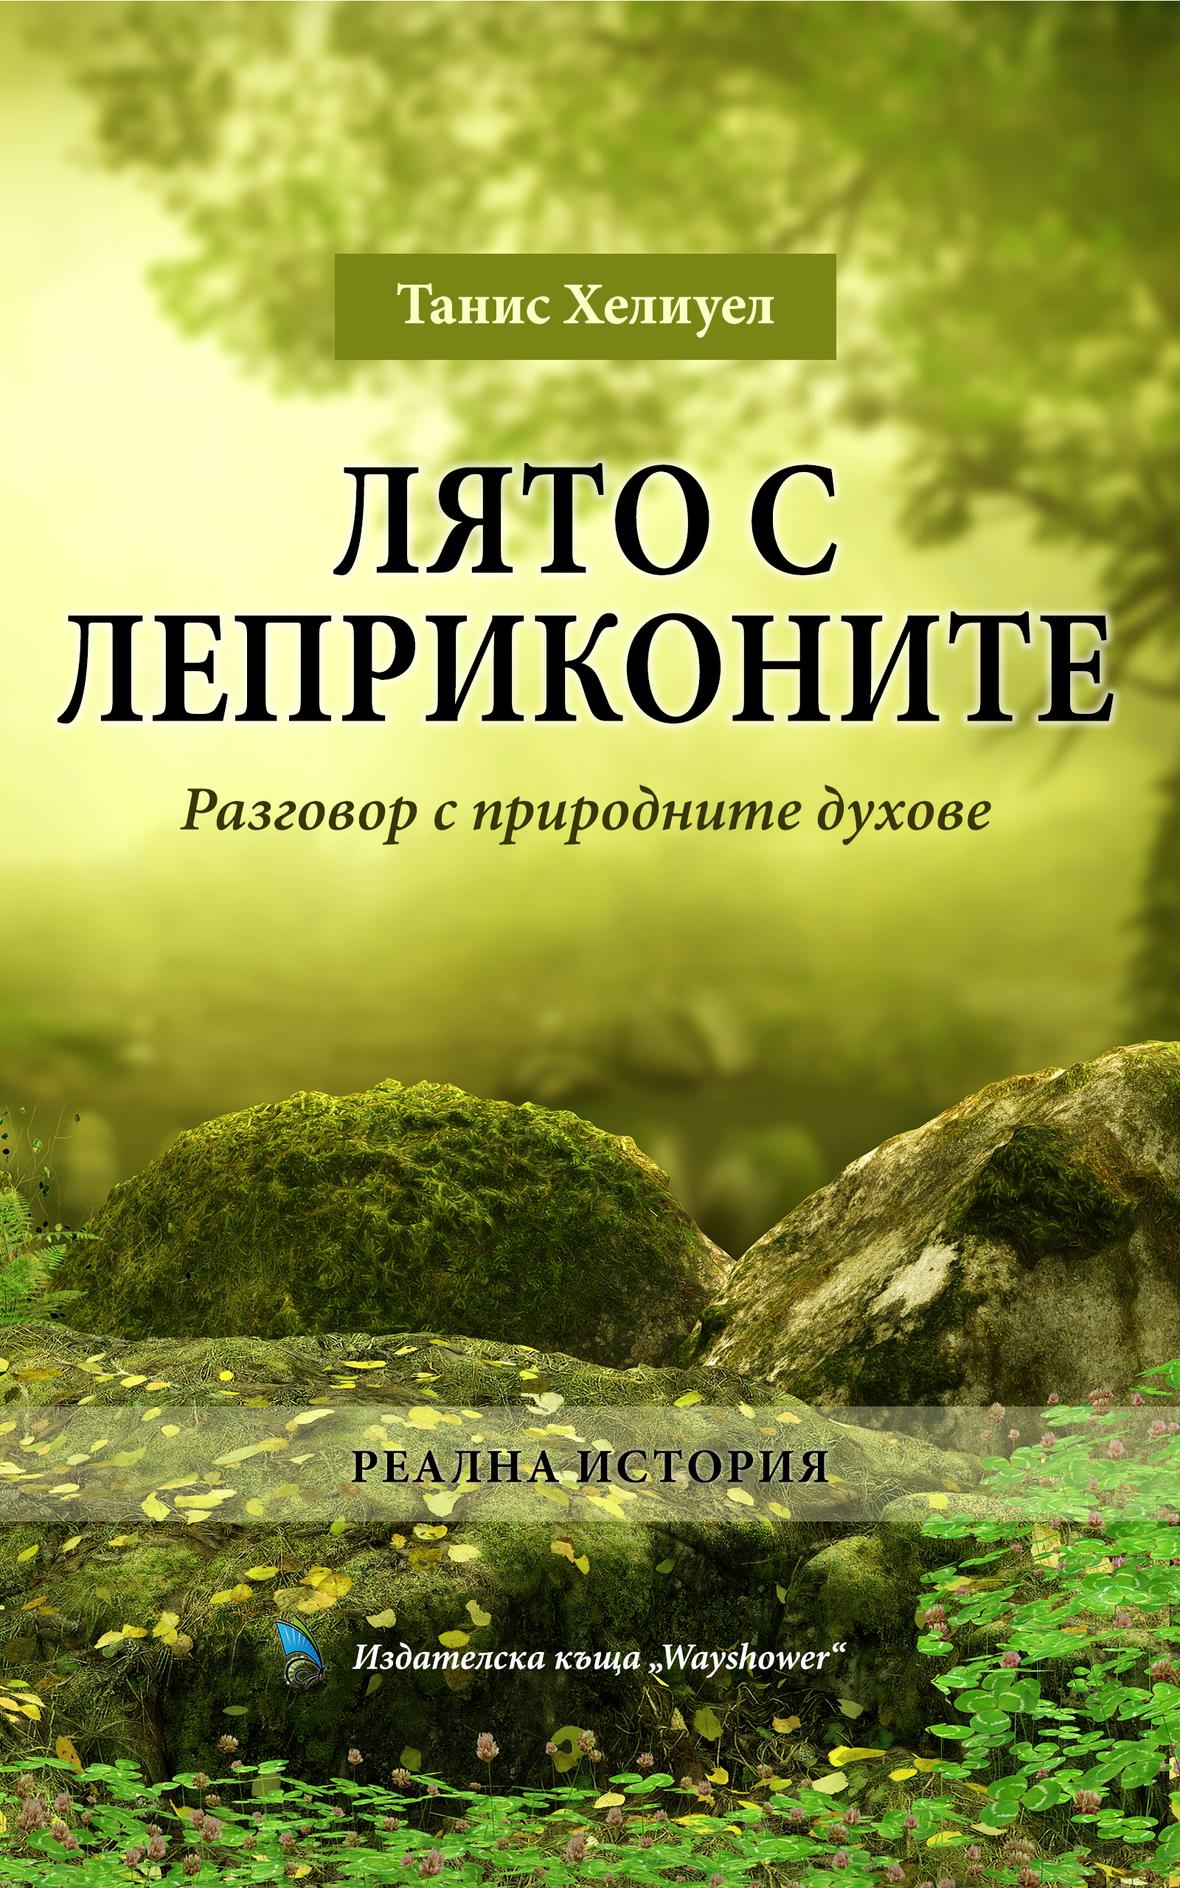 SWL-bulgarian-COVER-final-2021-03-23